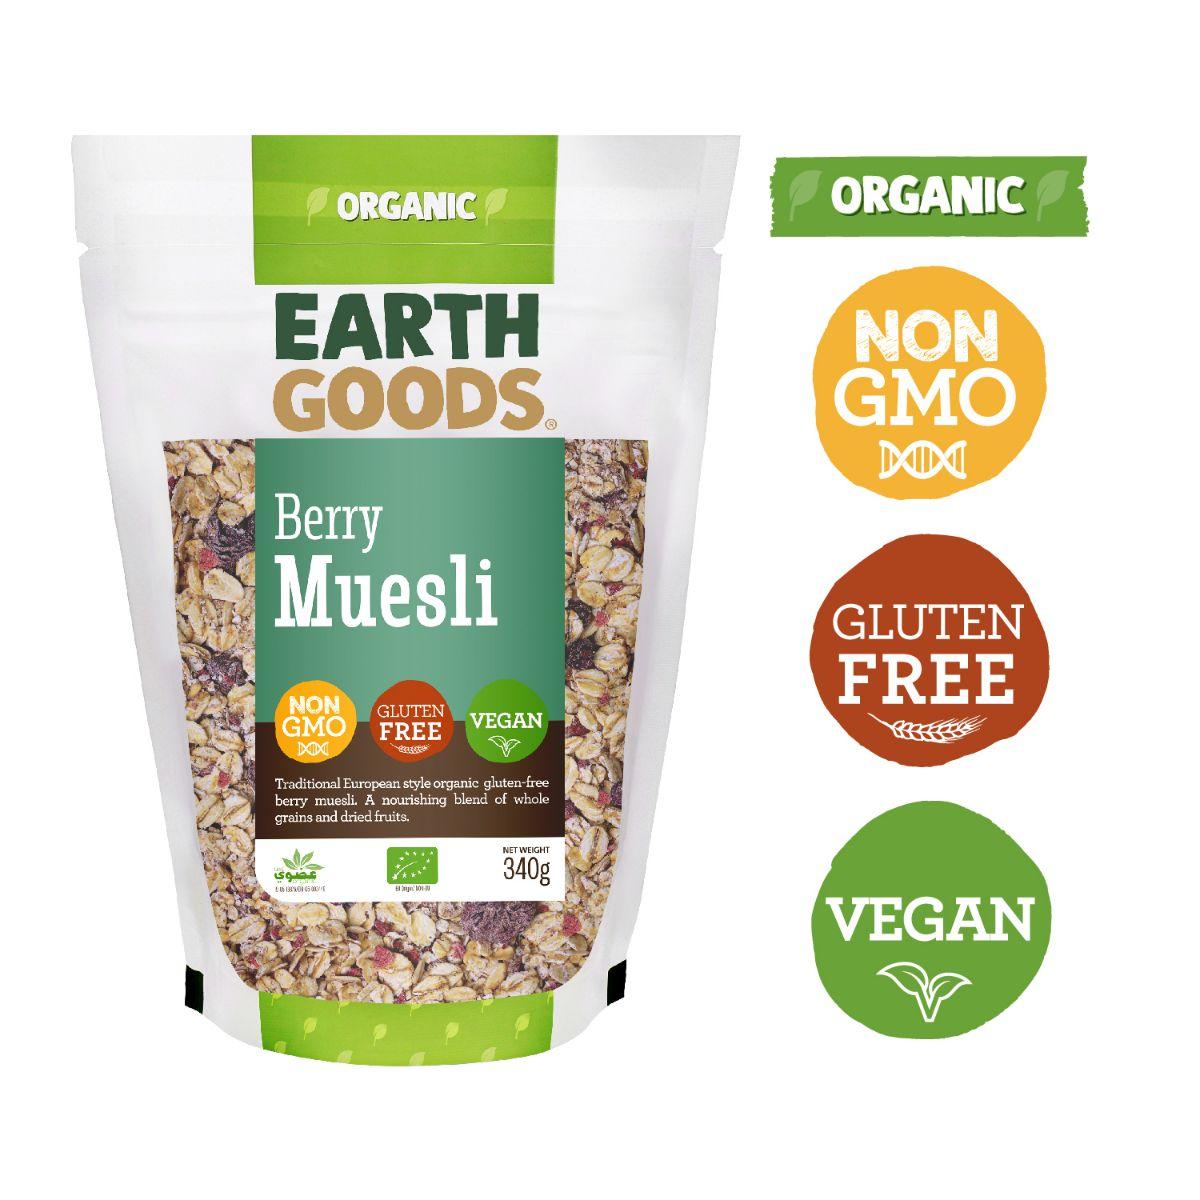 Earth Goods Organic GF Berry Muesli - 340g